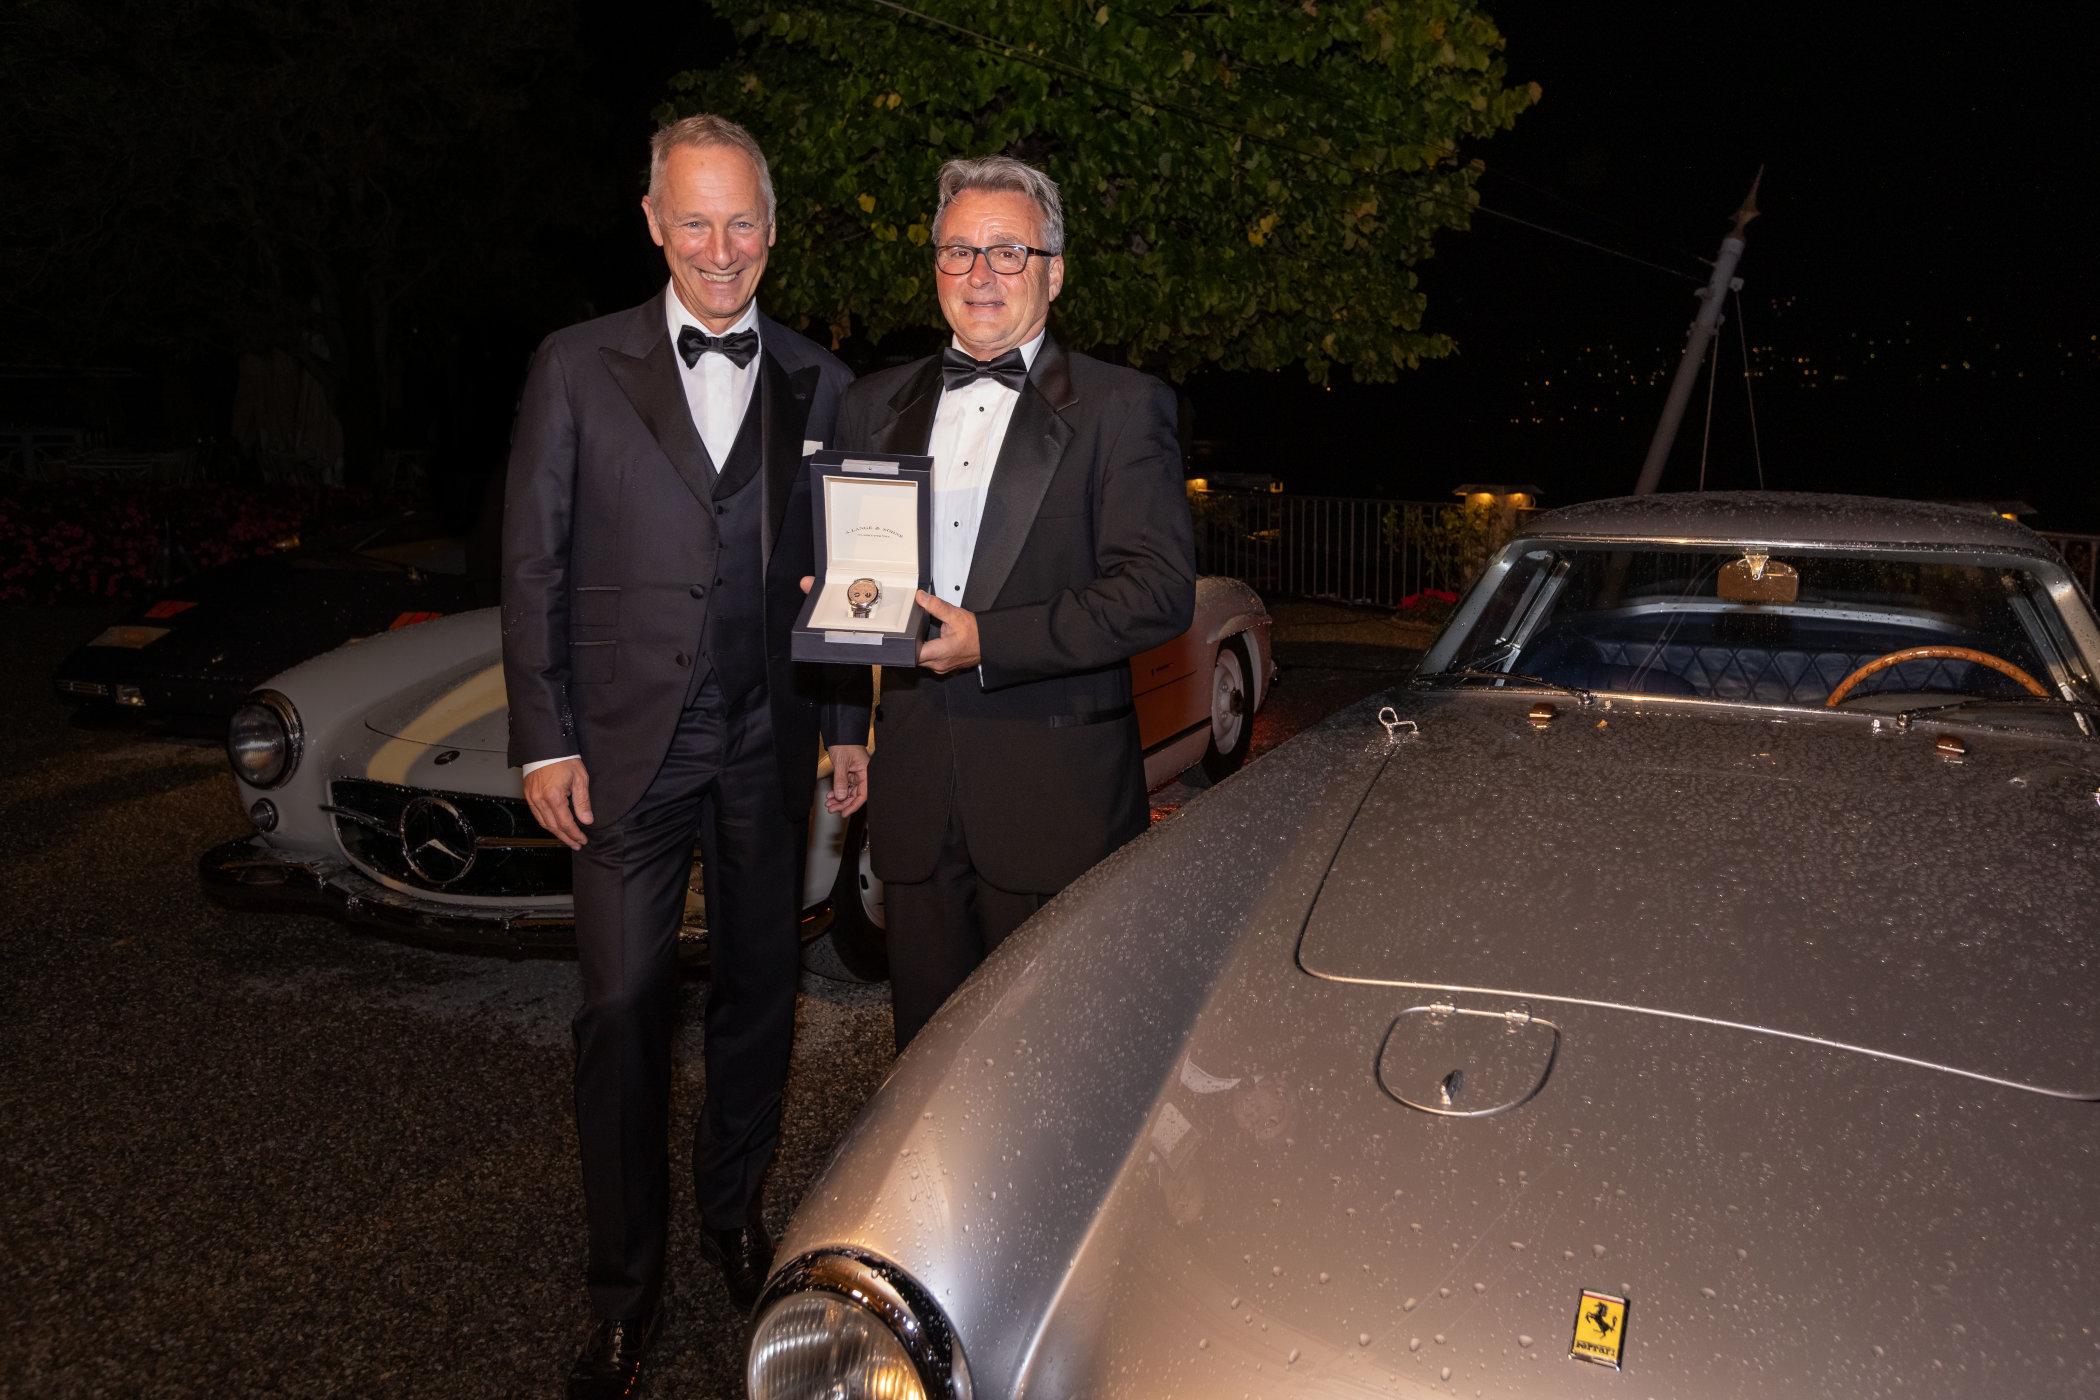 Concorso d'Eleganza Villa d'Este 2021 A. Lange & Söhne Brian Ross Best of Show winner and CEO Wilhelm Schmid 2